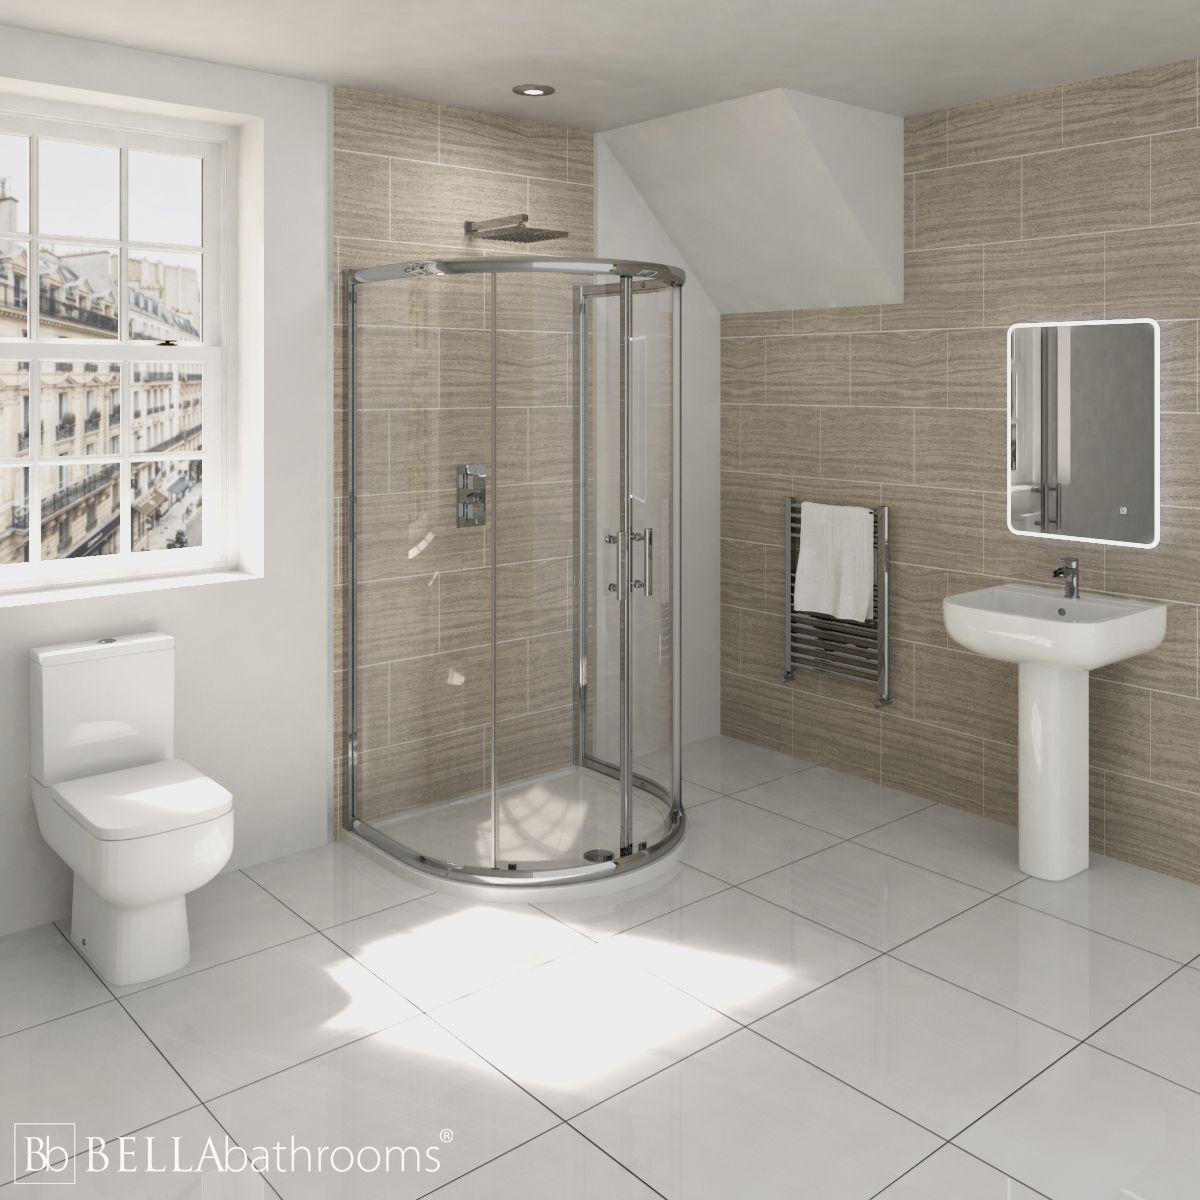 RAK Series 600 En-Suite Bathroom with Pacific D Shaped Shower Enclosure